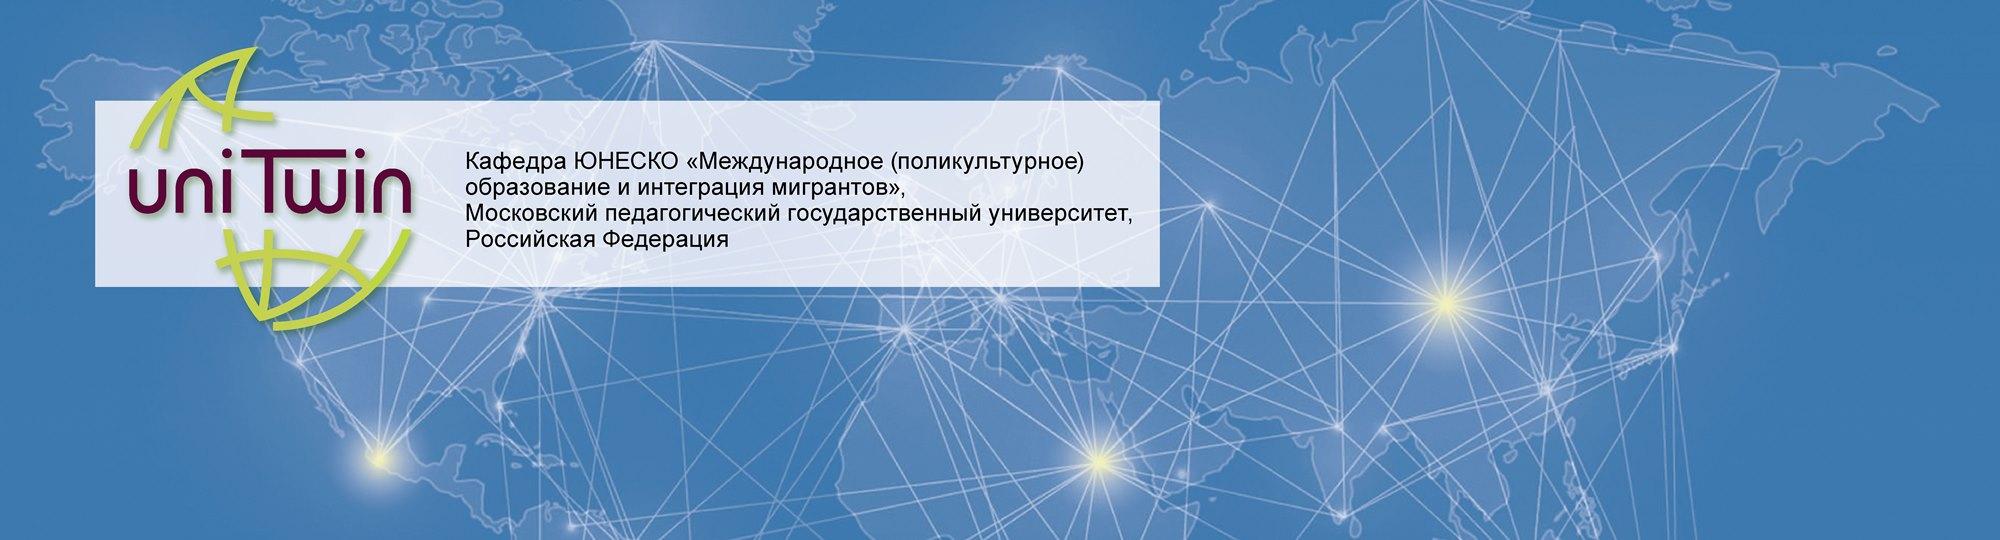 Banner-UNESCO-rus-blue